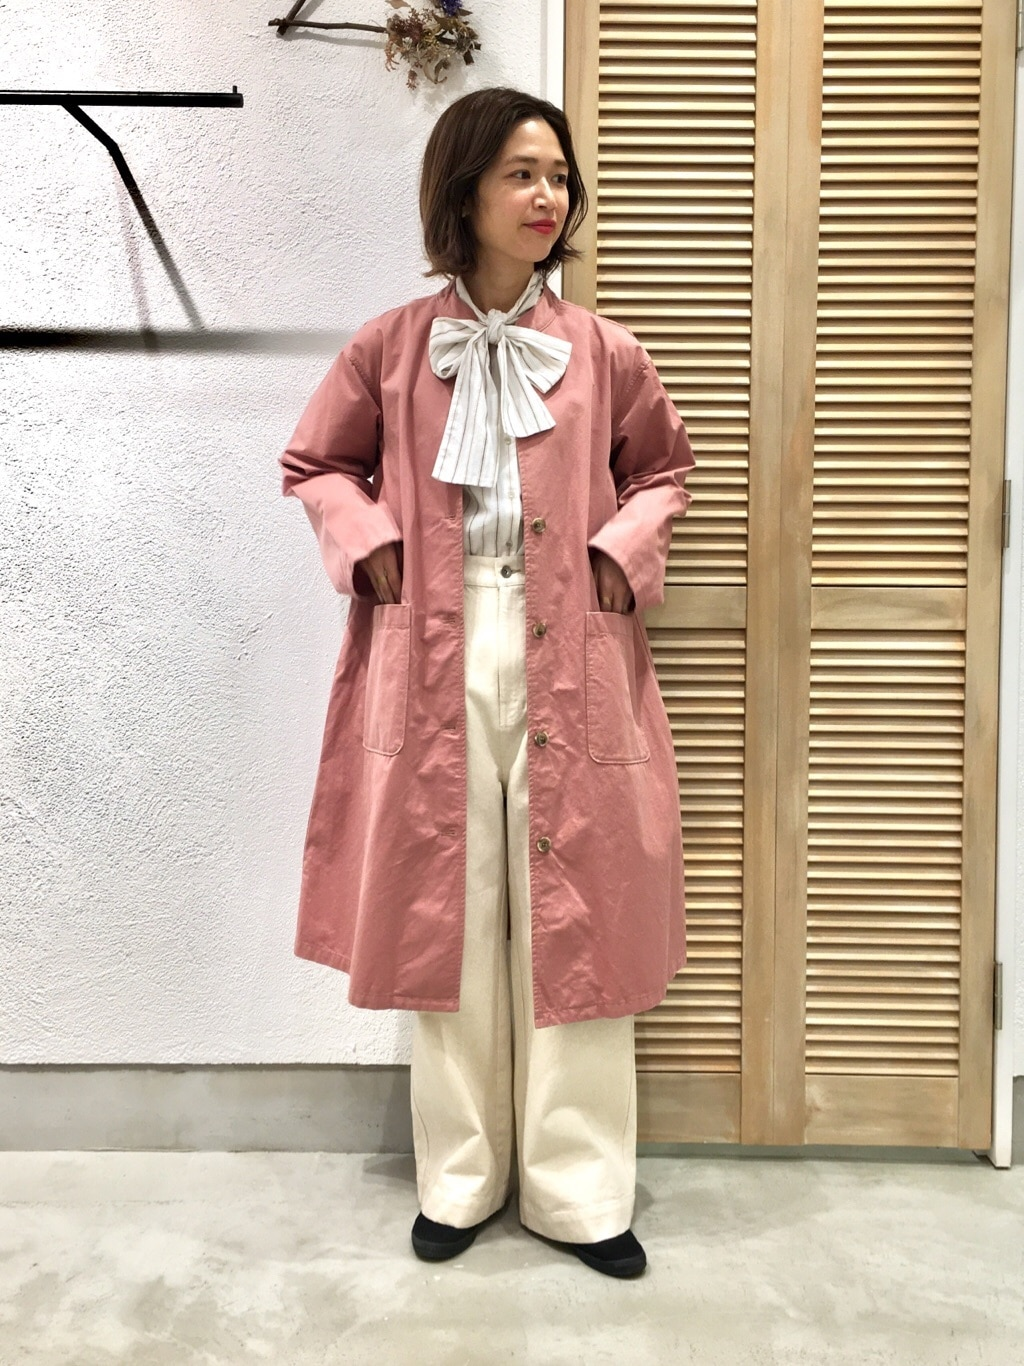 chambre de charme 横浜ジョイナス 身長:160cm 2021.02.19